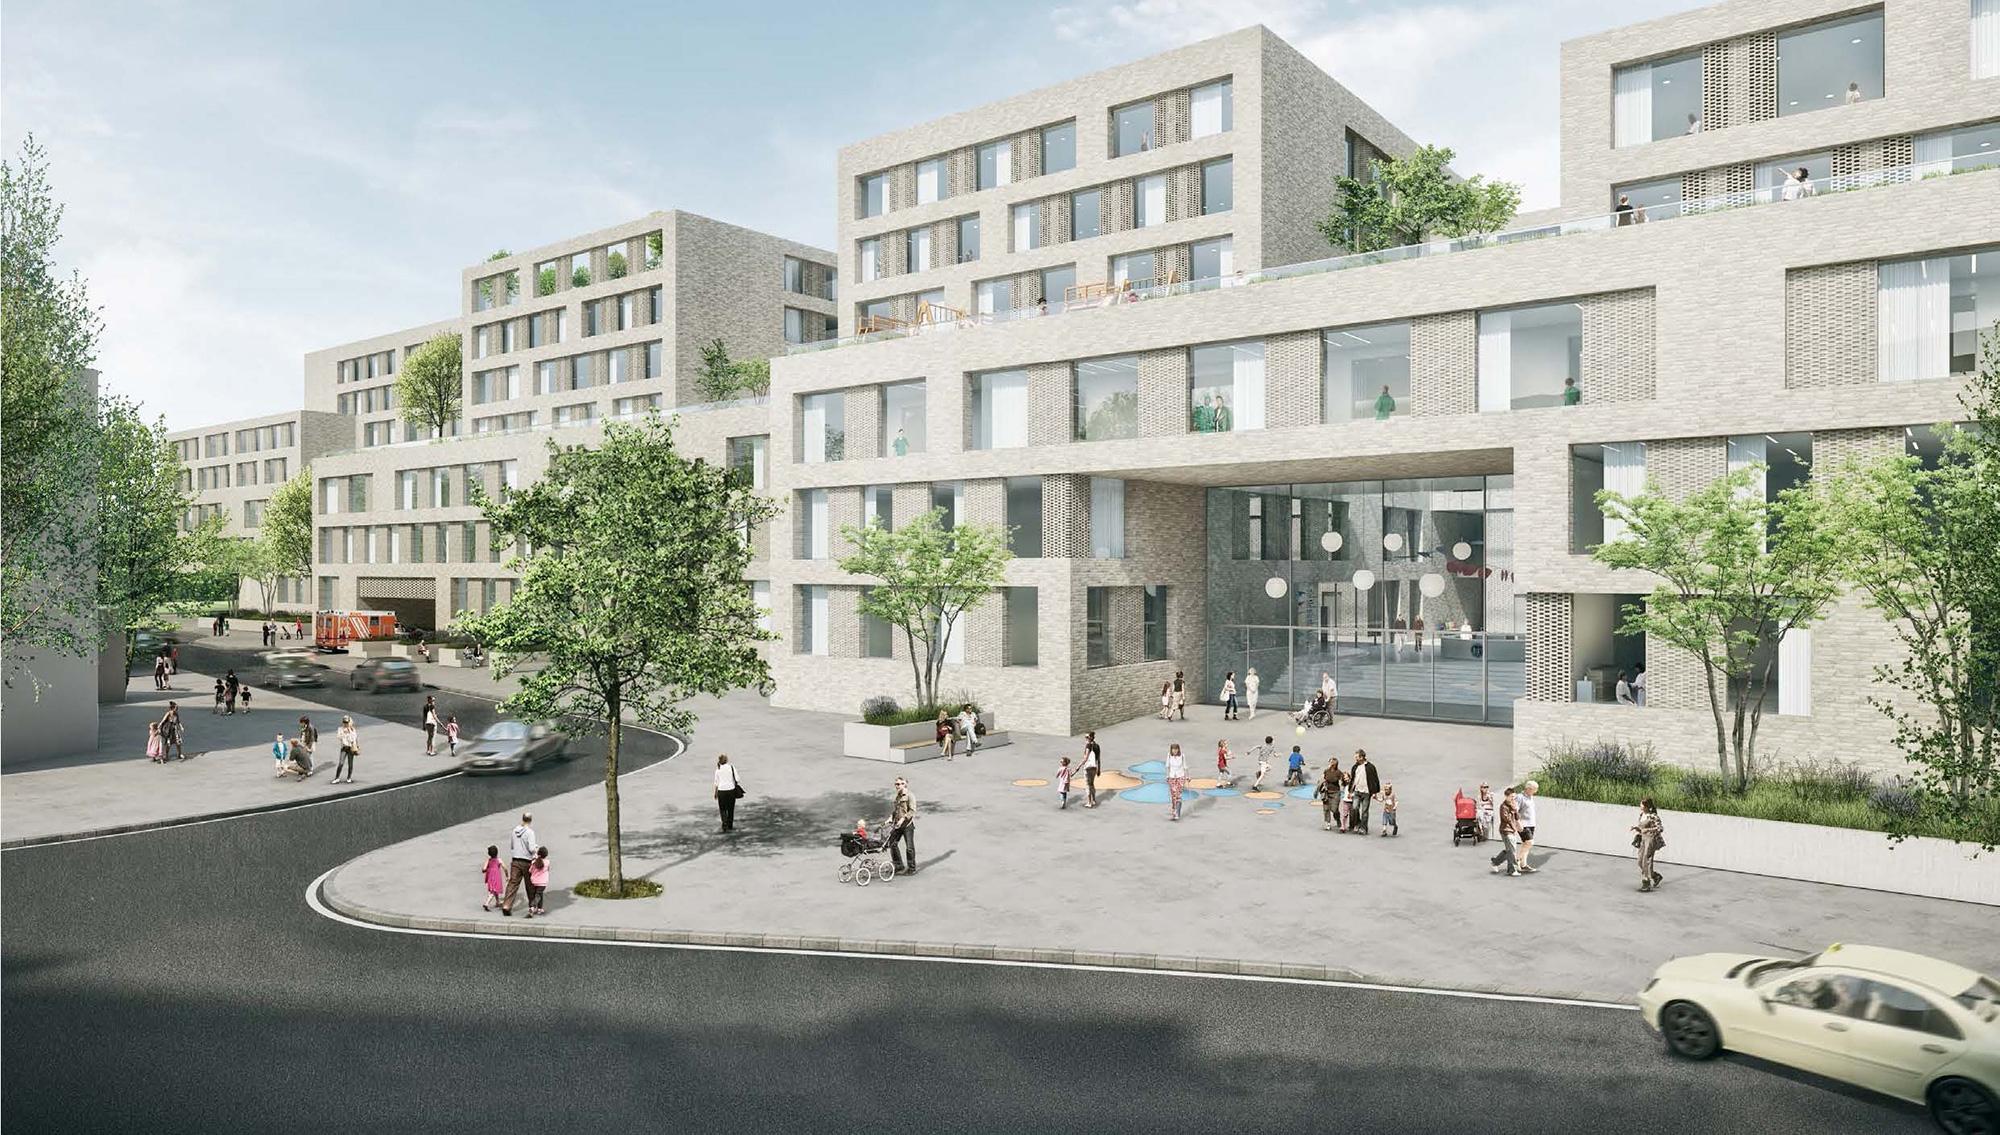 Landschaftsarchitekten Köln rmp stephan lenzen landschaftsarchitekten universitätsklinikum köln